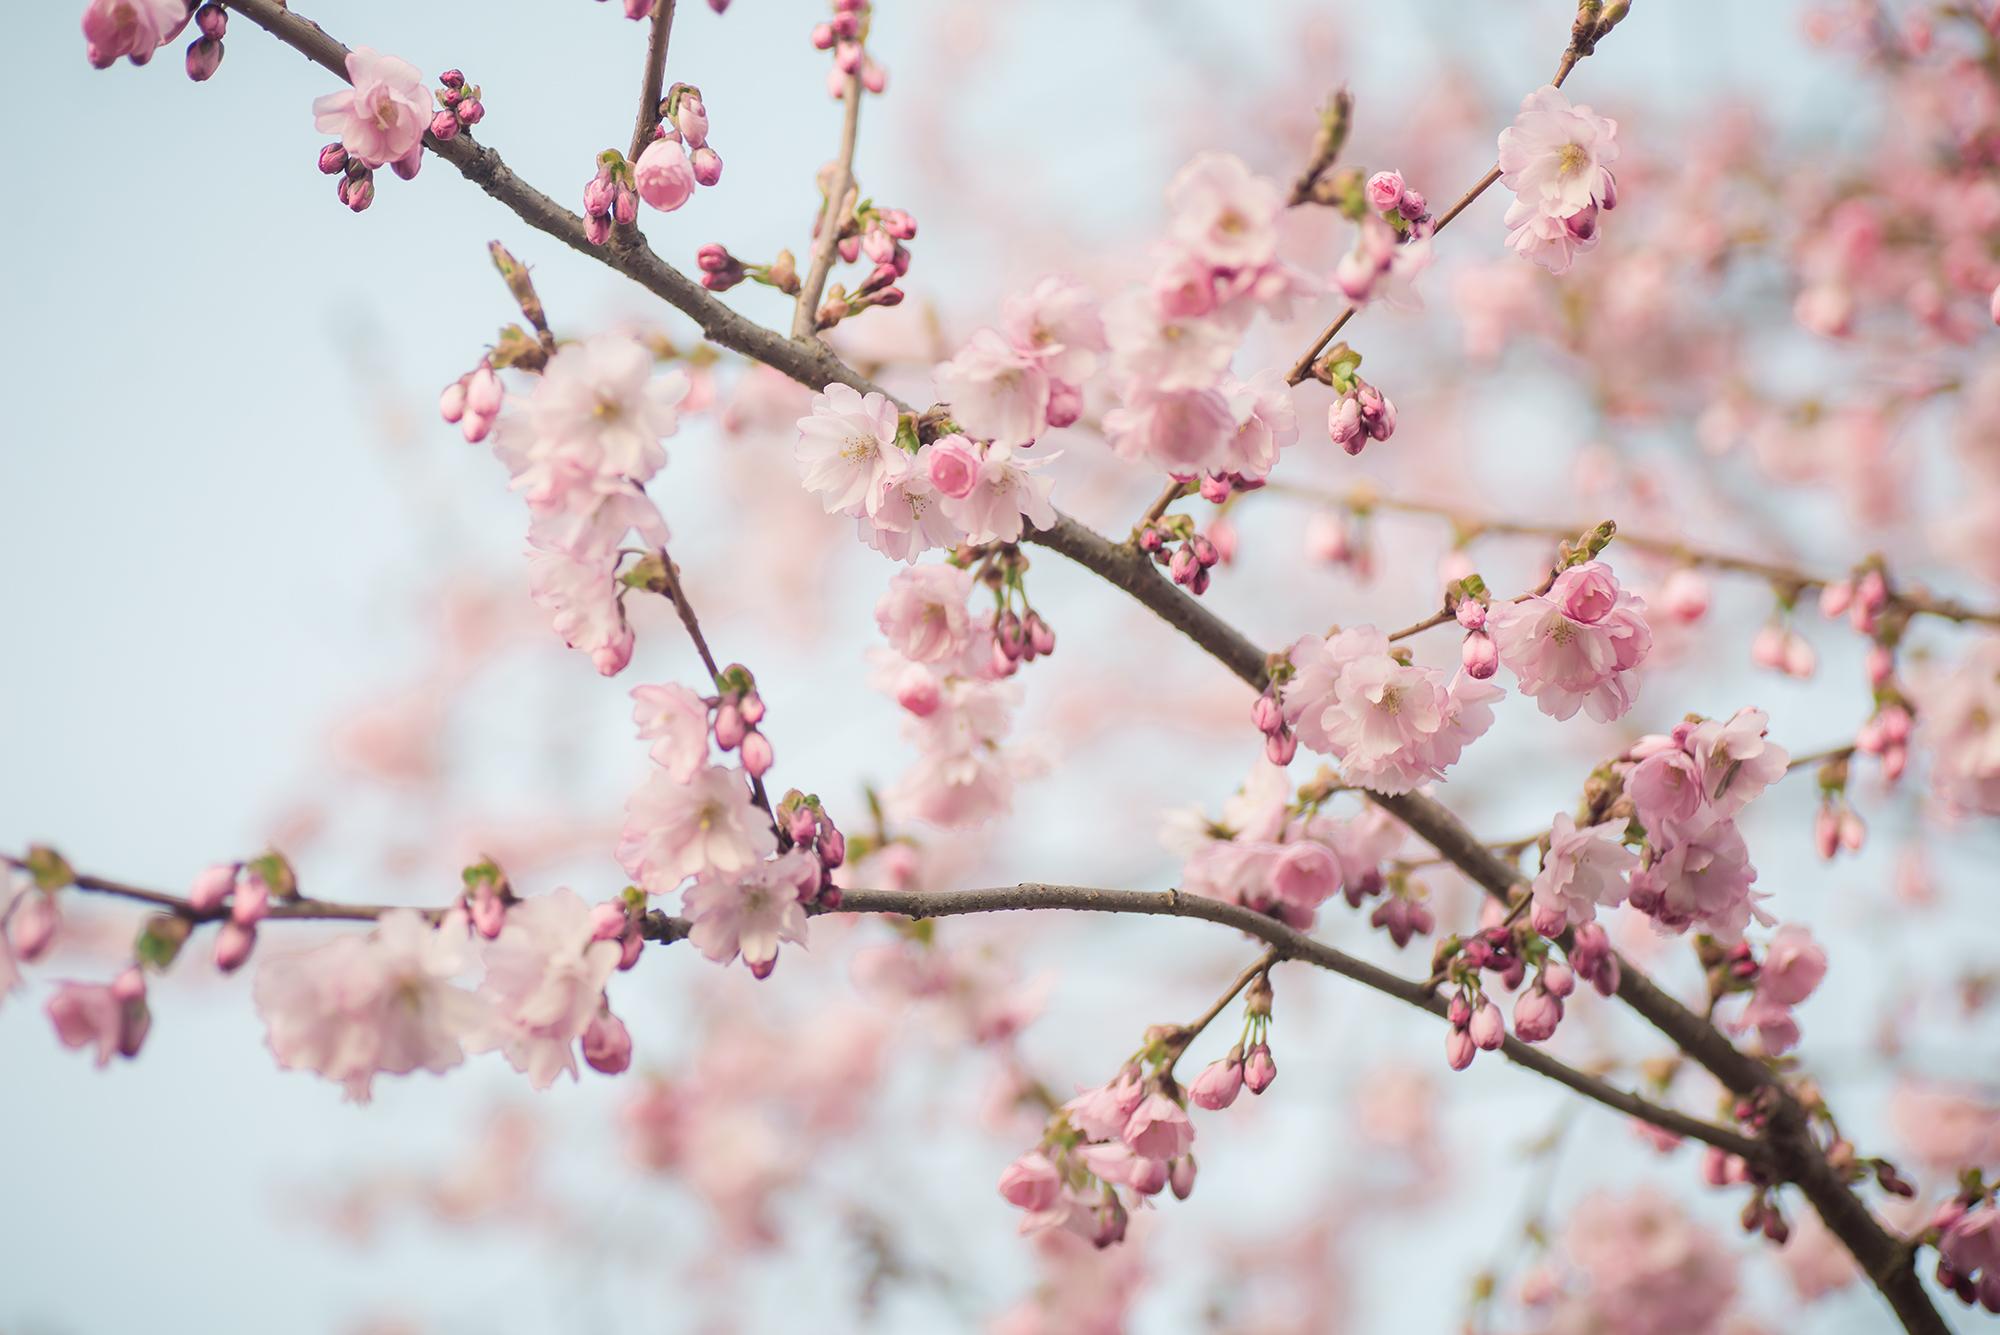 karinafotografi_blommor1